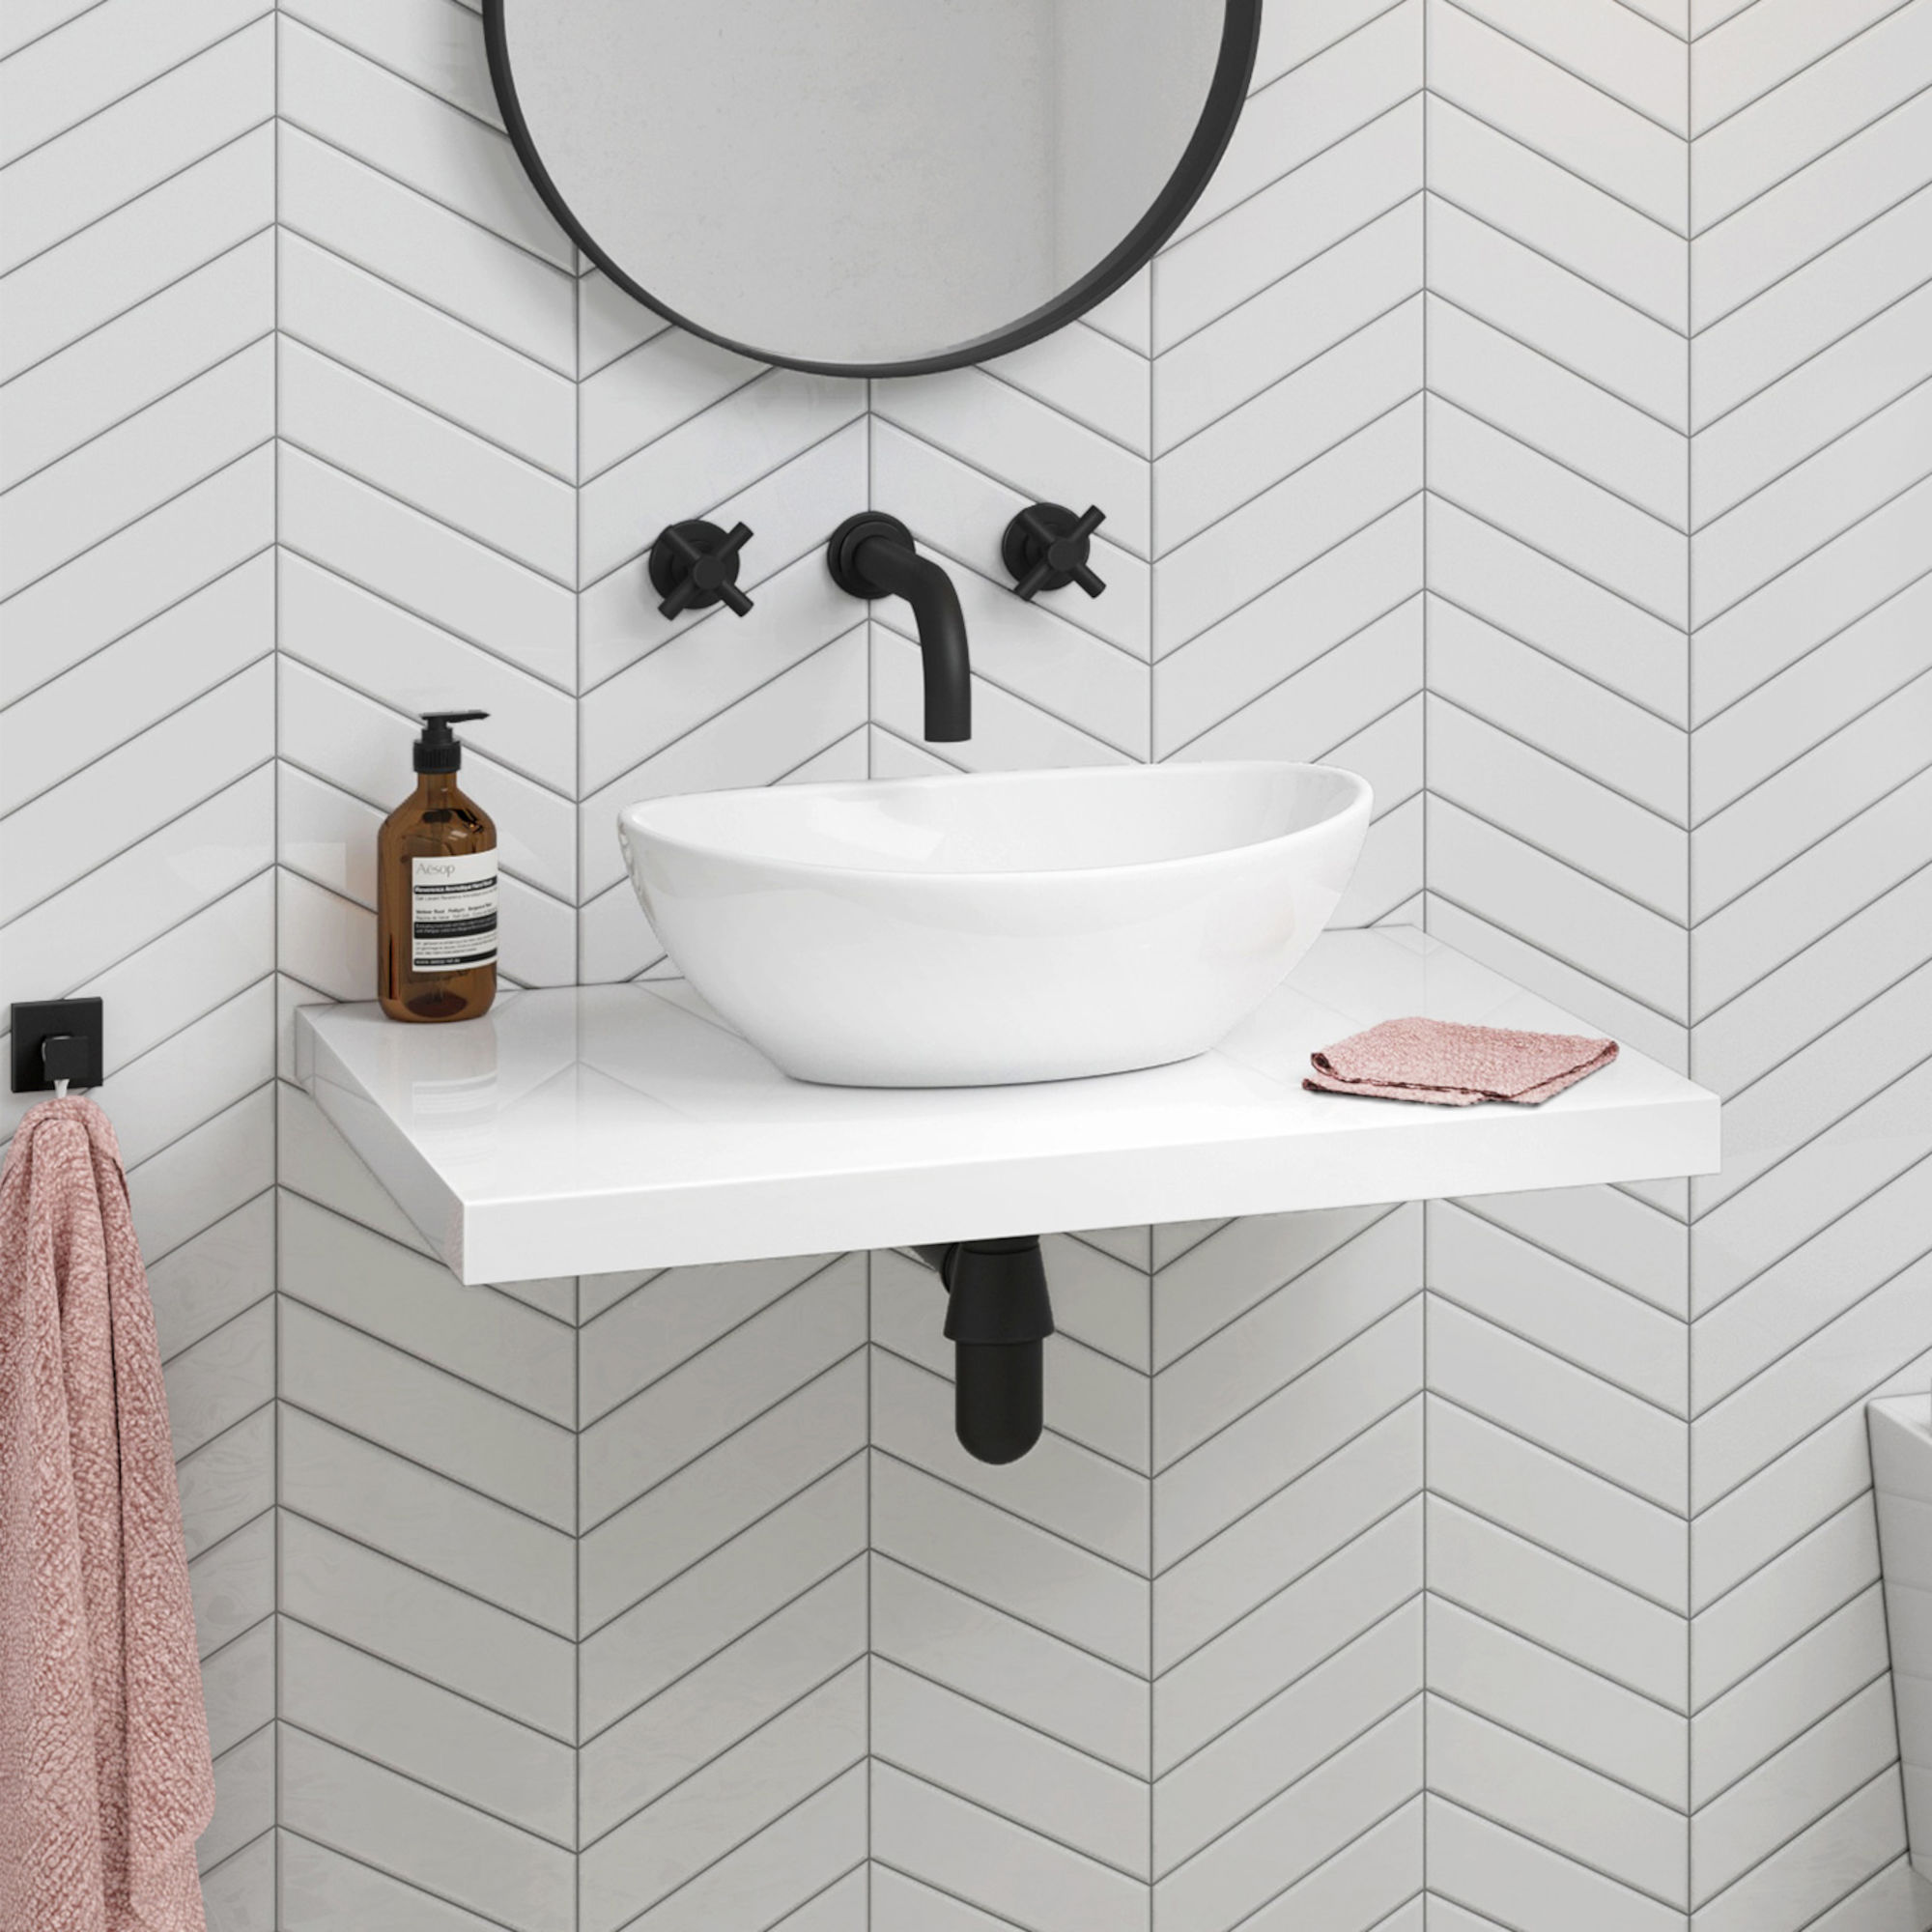 our new floating bathroom sinks for contemporary soak fscamhgw shelf sink shelves design over the storage slim corner ikea lack desk cream colored under grey bookshelf wall cable